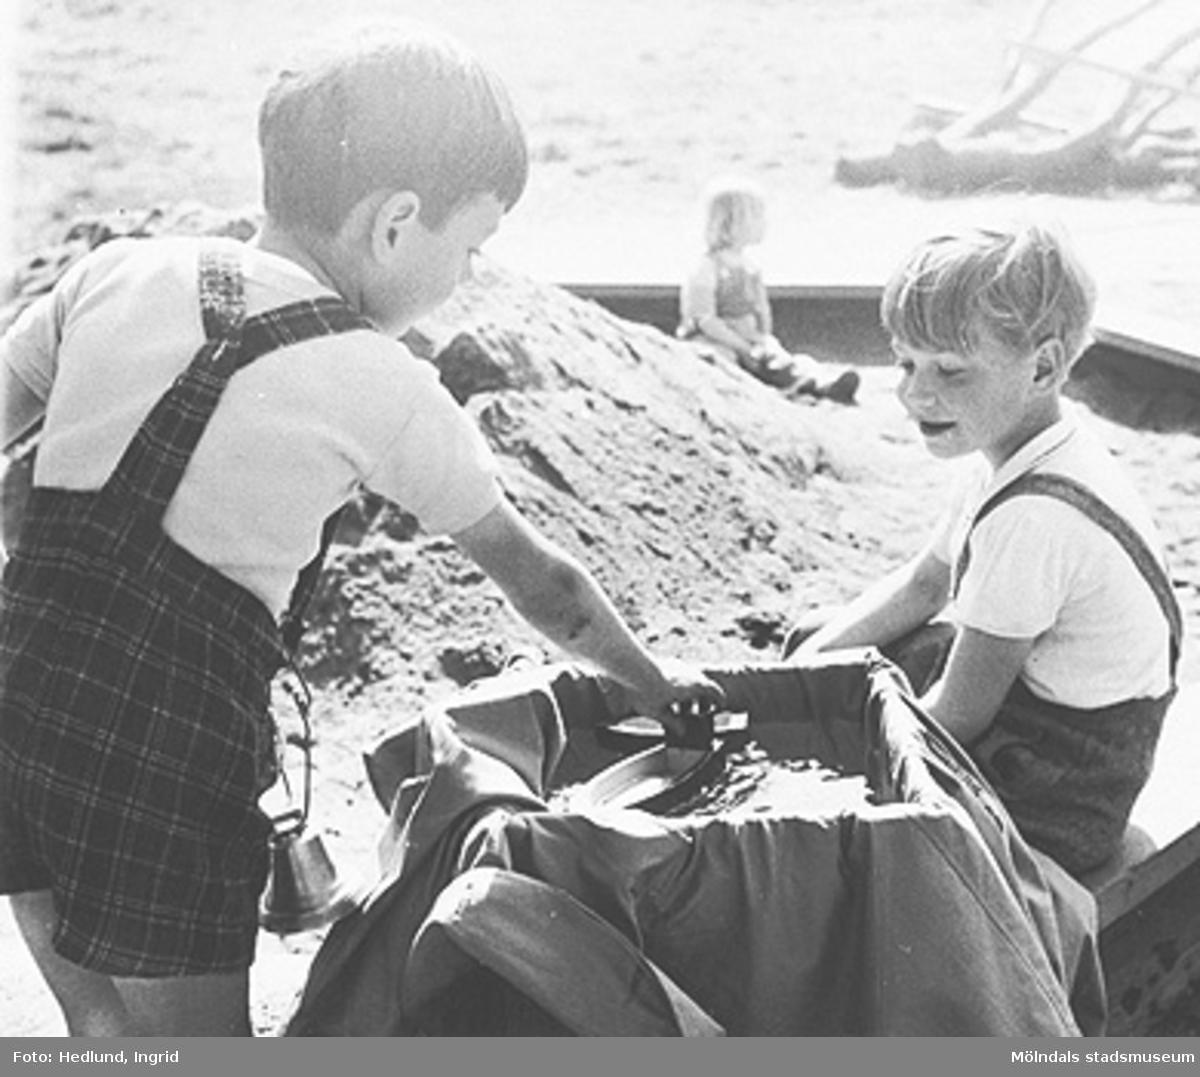 Två pojkar gör en vattenlek i sandlådan. Daghem i Guldheden, Göteborg. Sent 1940-tal.